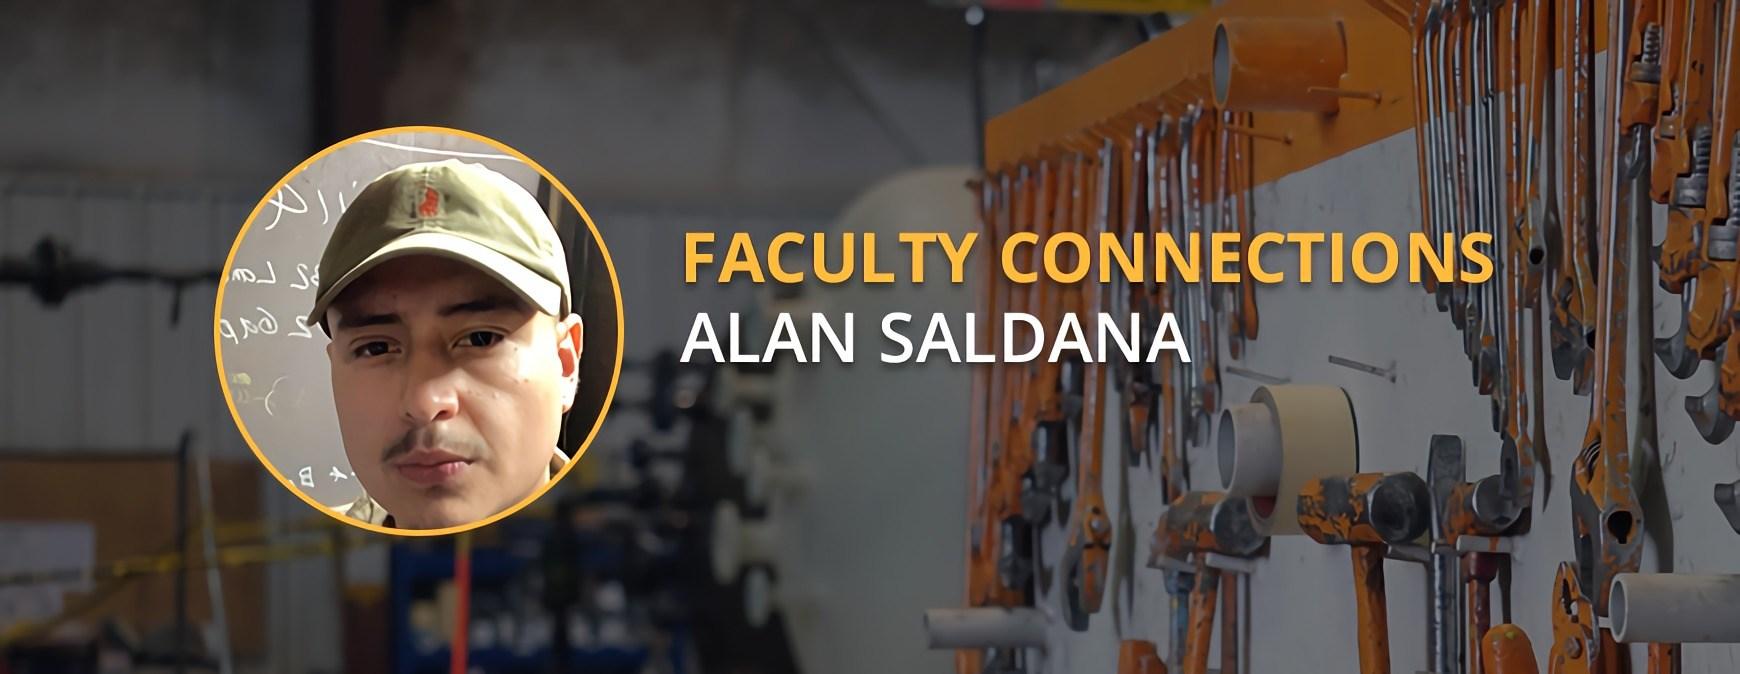 Alan Saldana FC